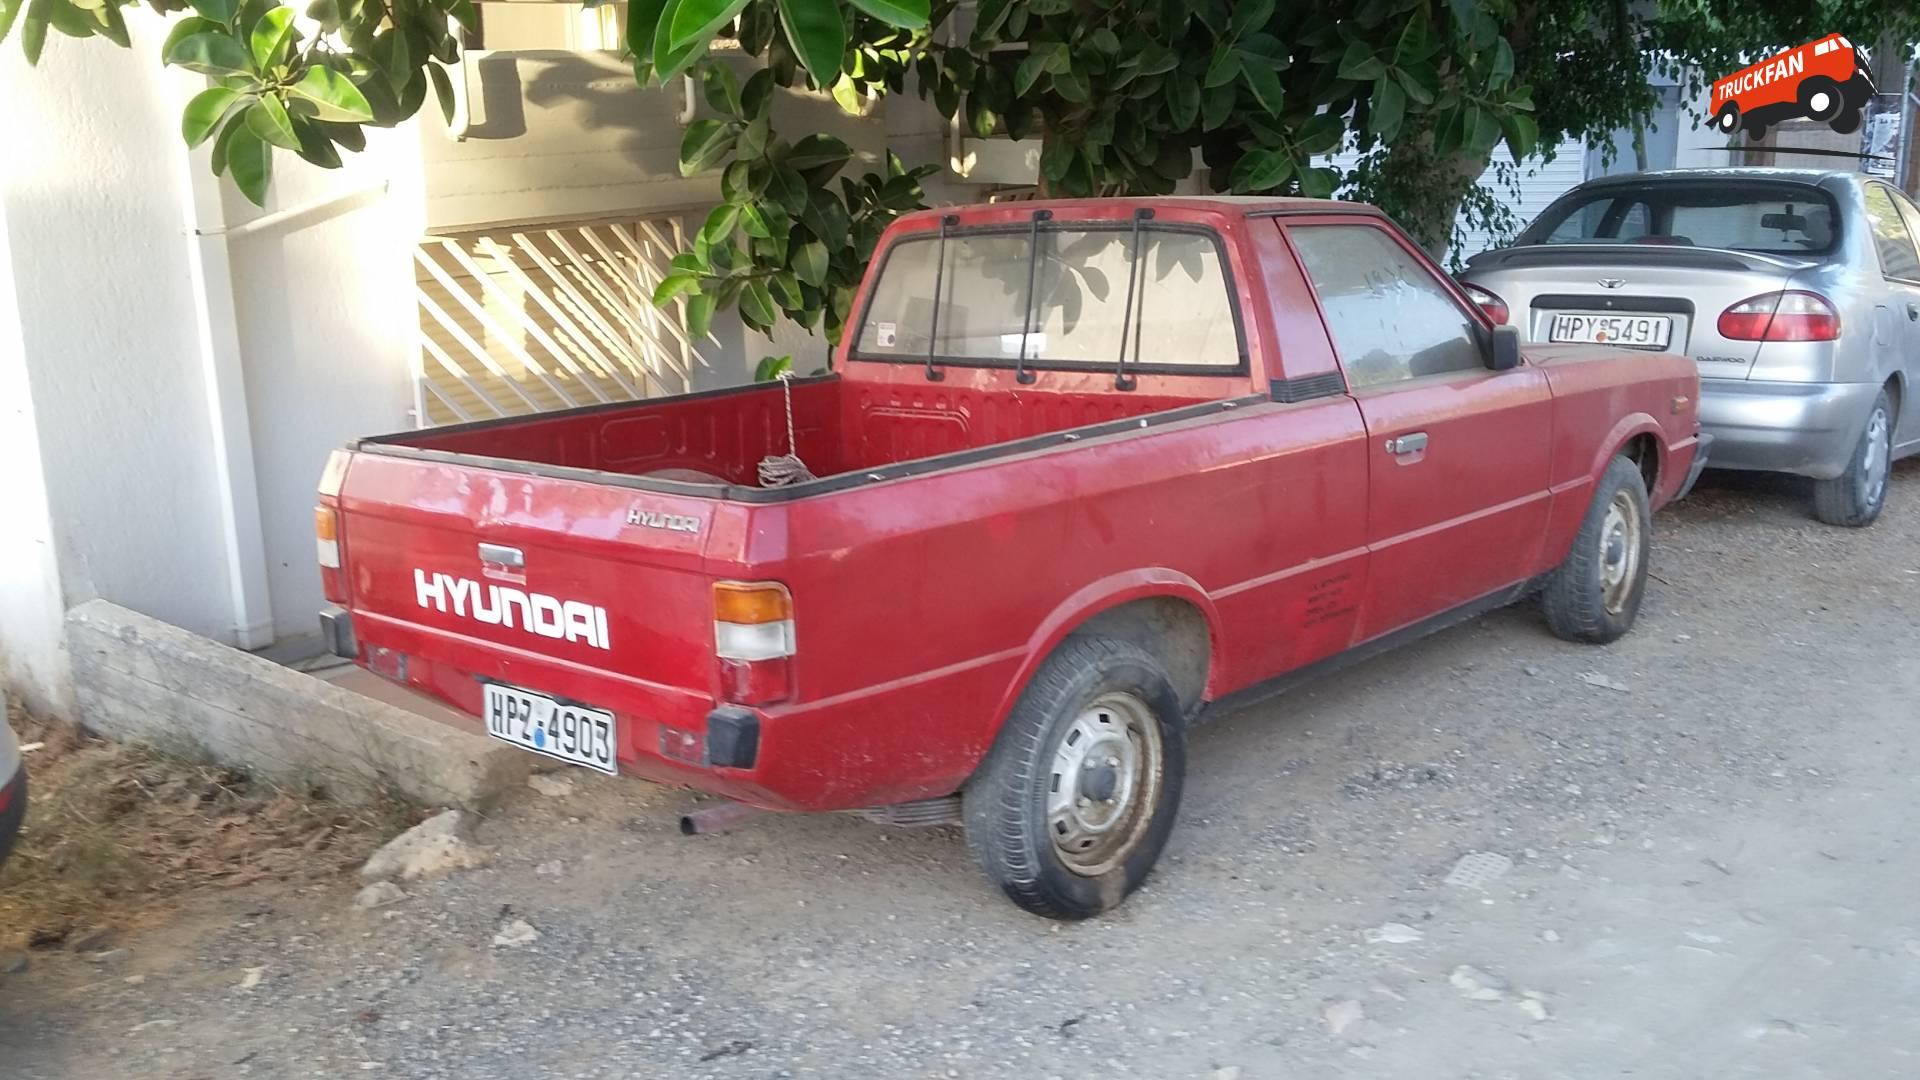 Hyundai overig/onbekend